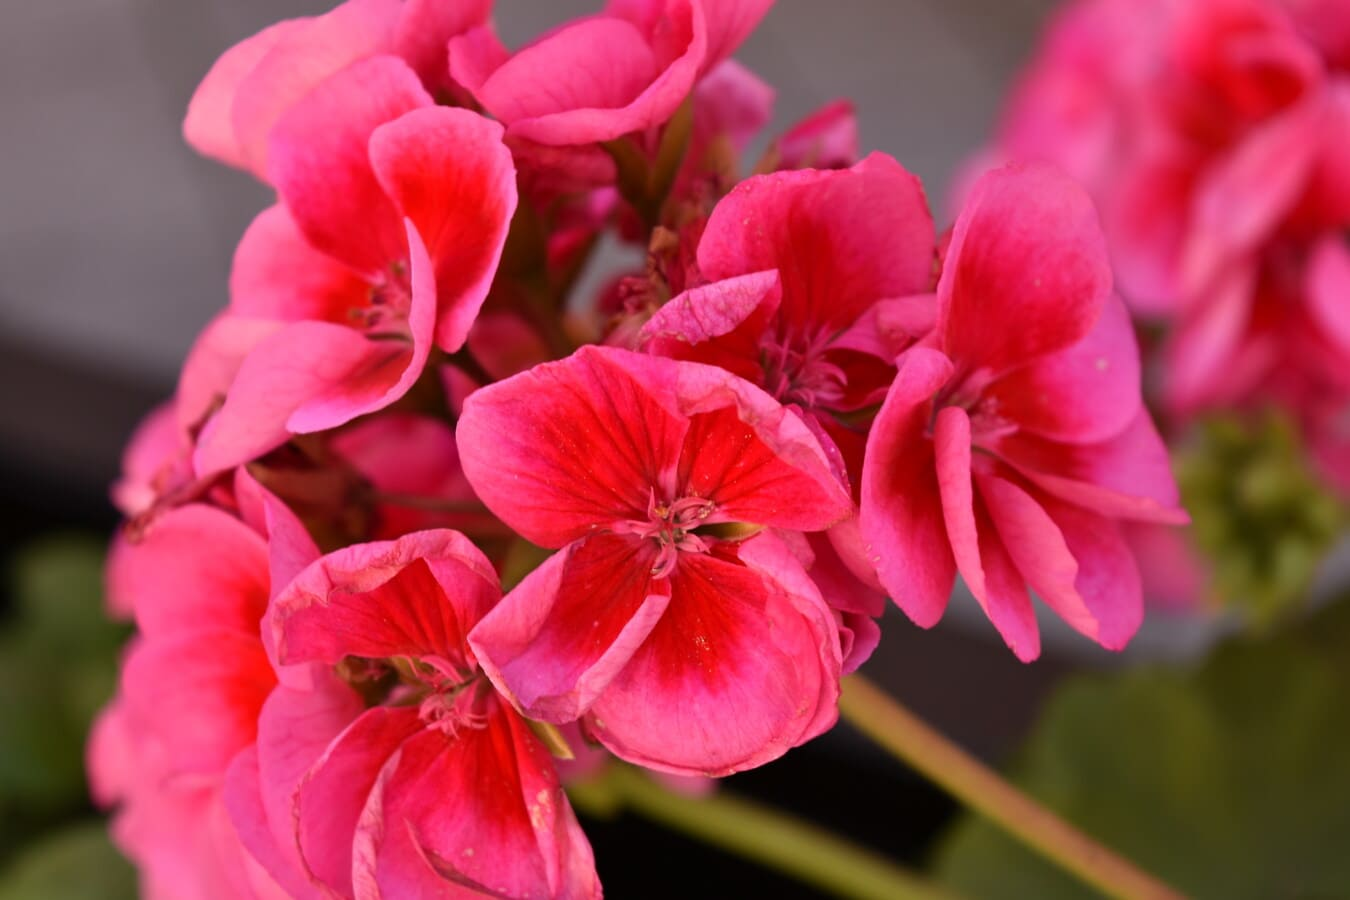 pink, geranium, vibrant, flowers, stem, nature, plant, herb, blossom, garden